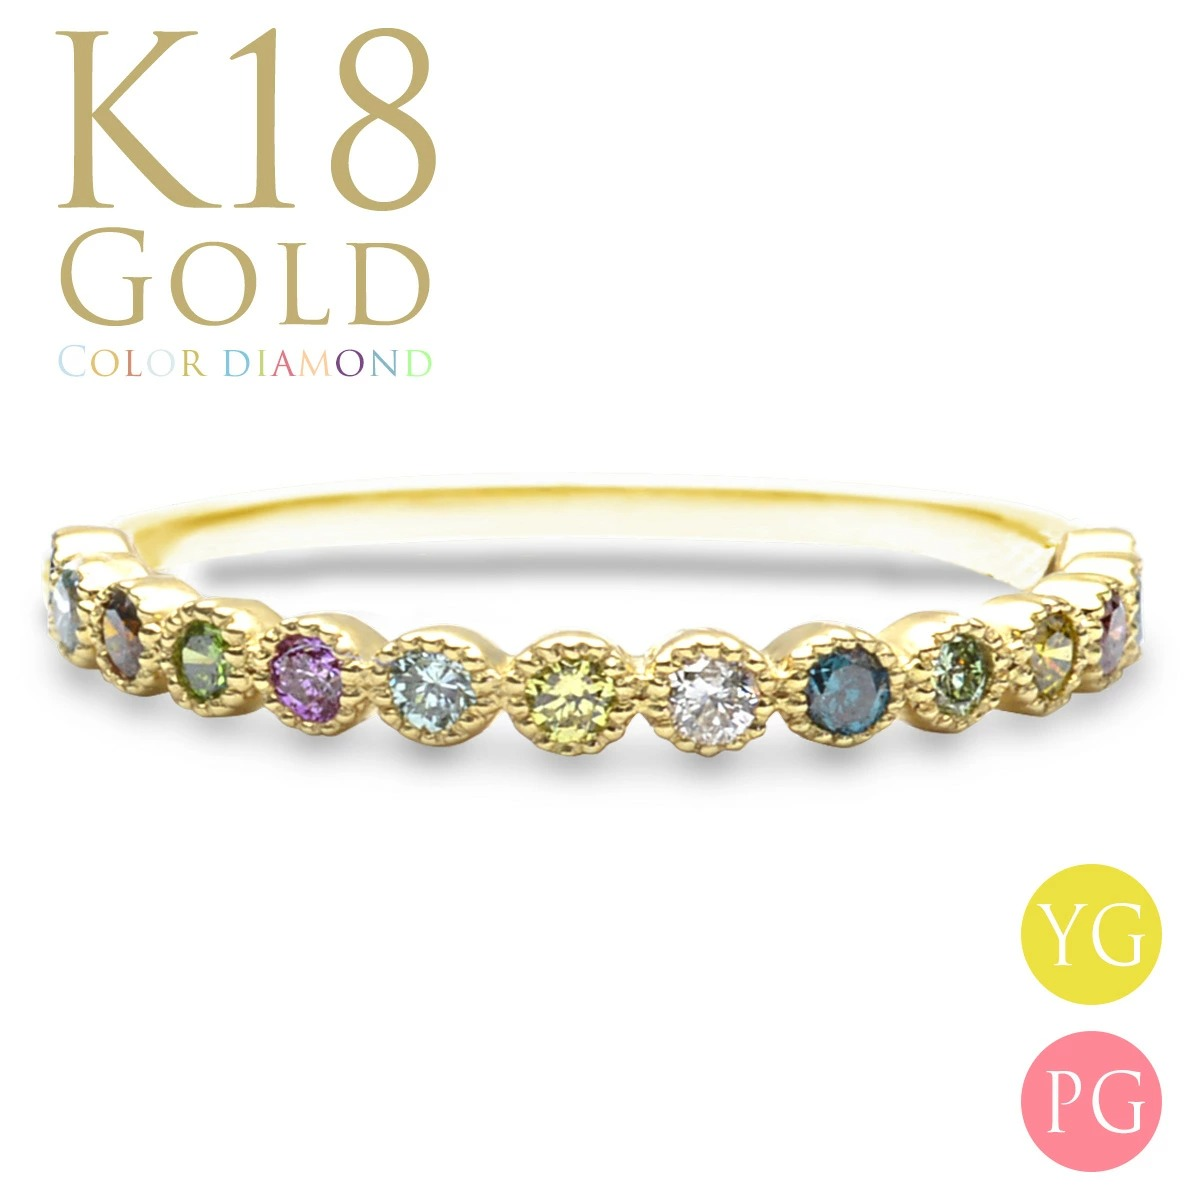 K18 ゴールド リング 指輪 カラーダイヤモンド  ミルグレイン リング RERALUy rri1657k18 新作